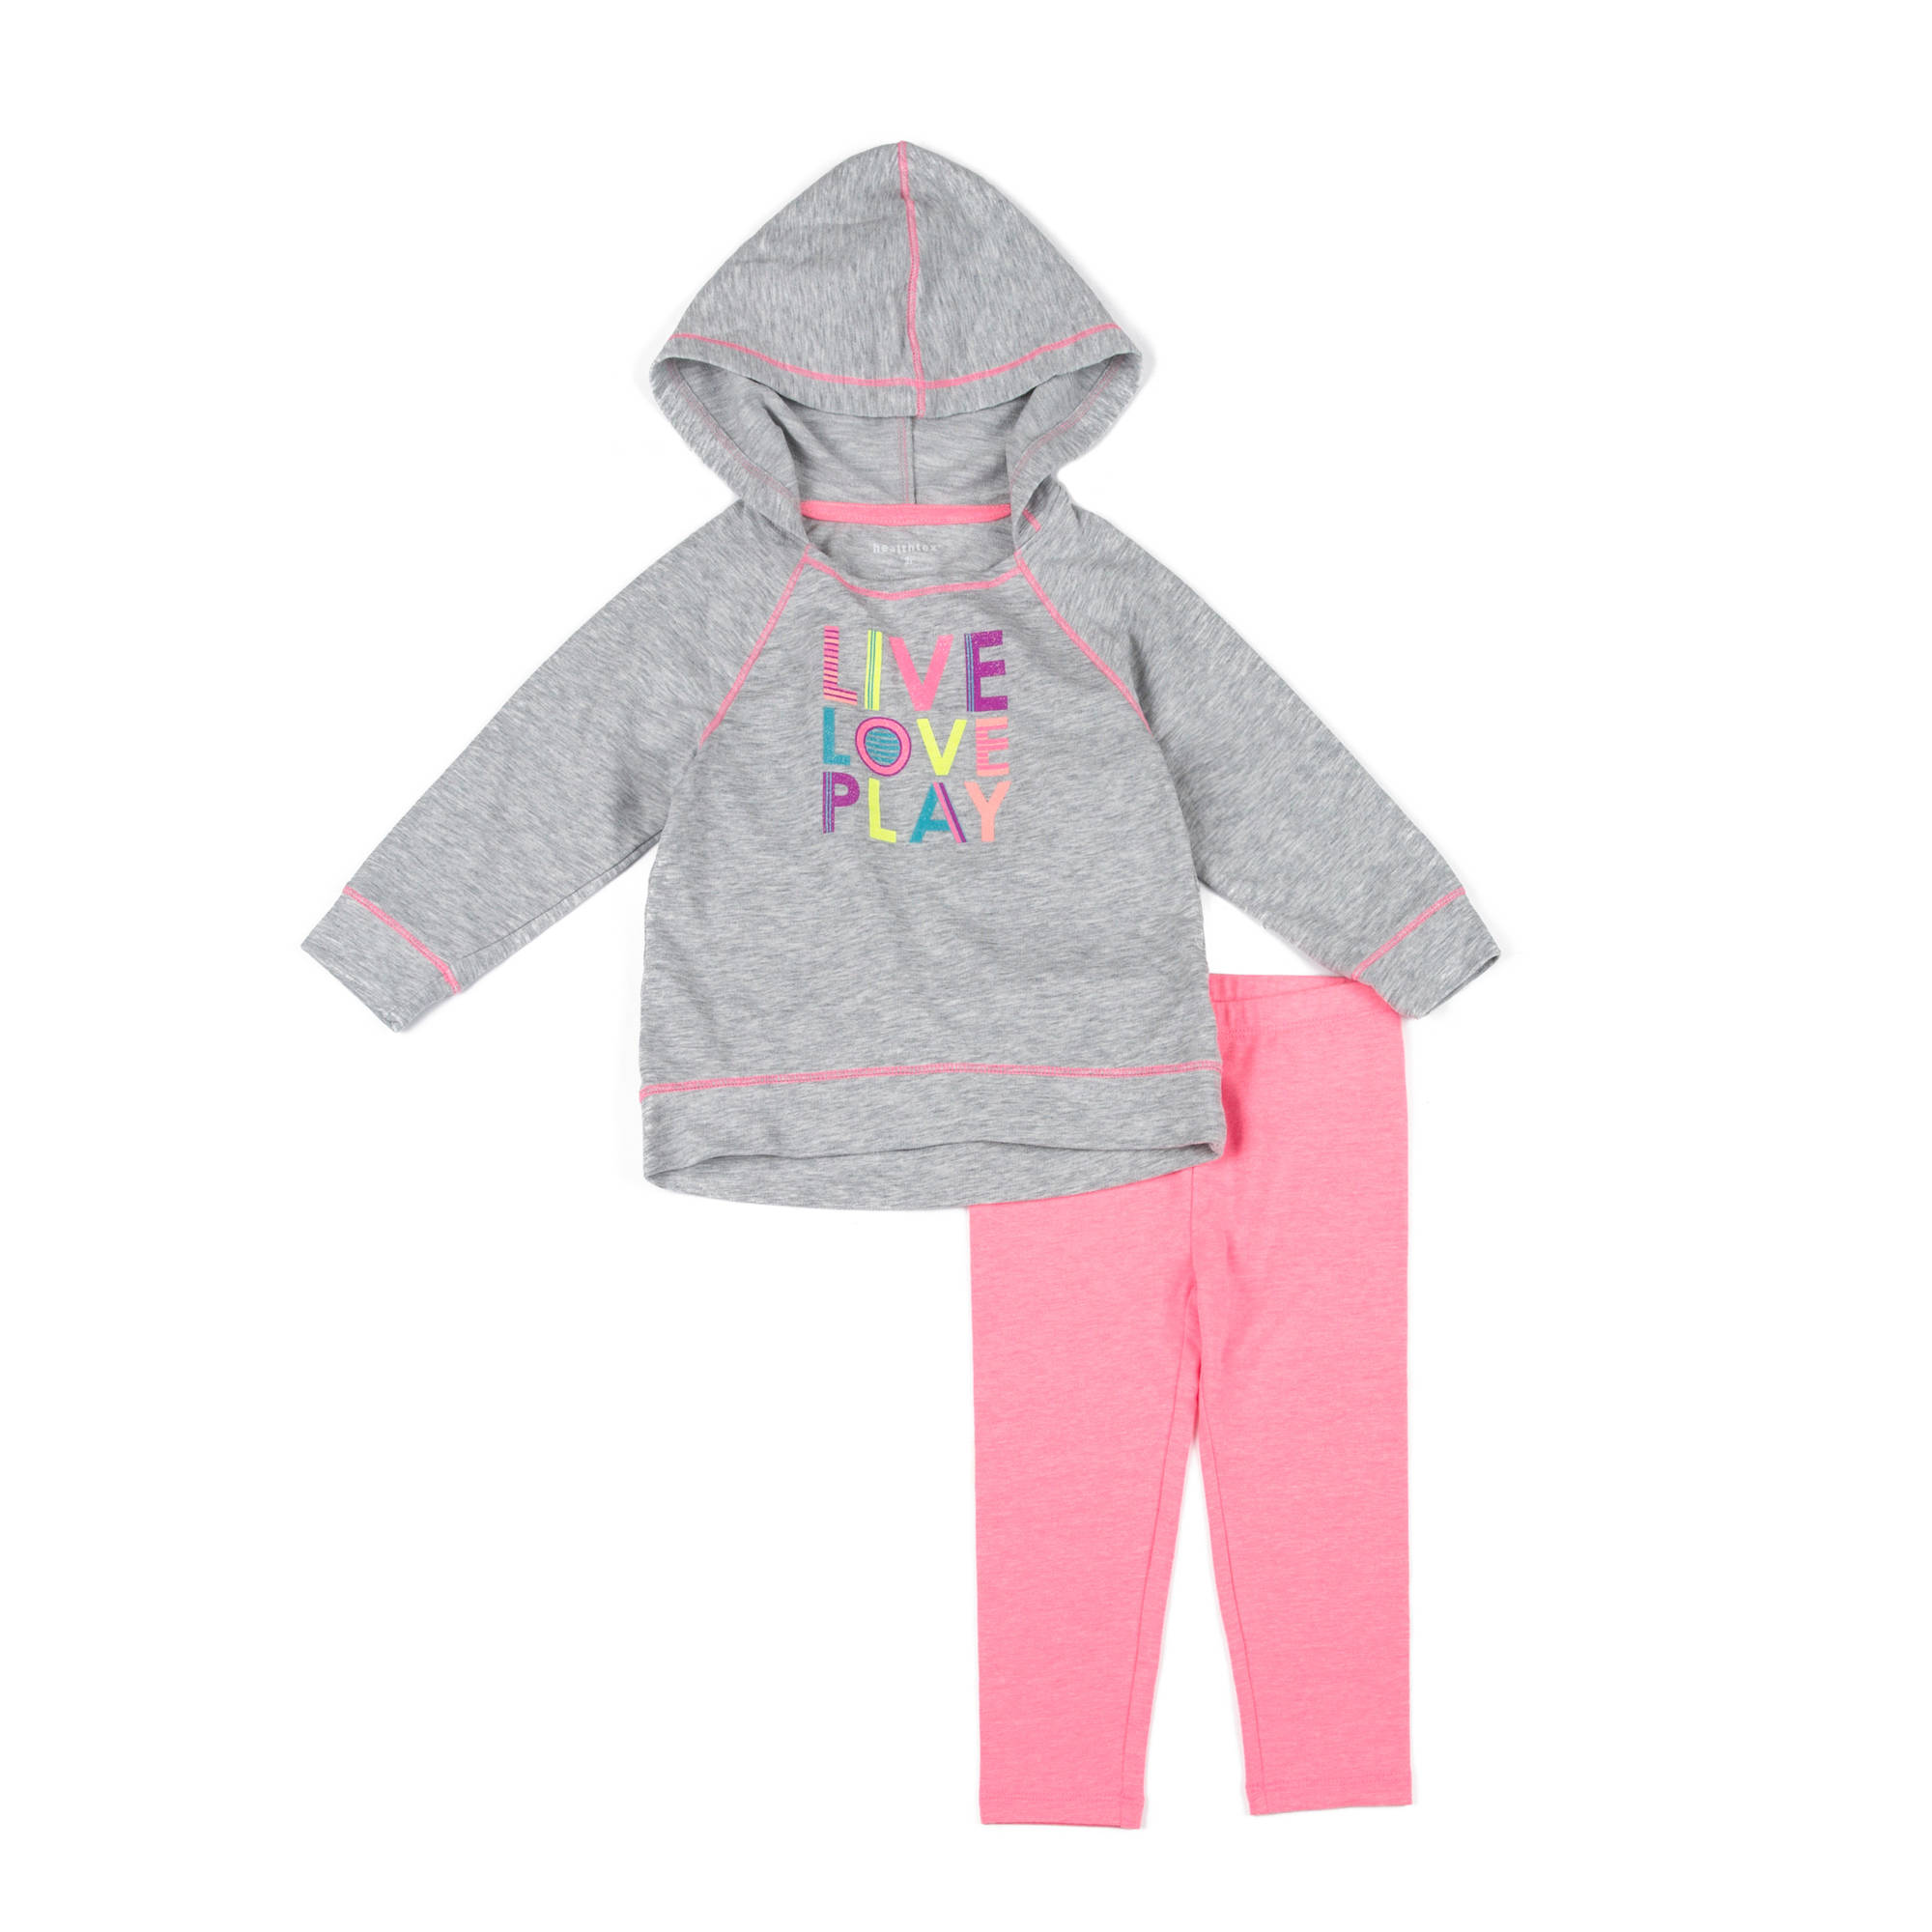 Healthtex Baby Toddler Girl Activewear 2-piece Set